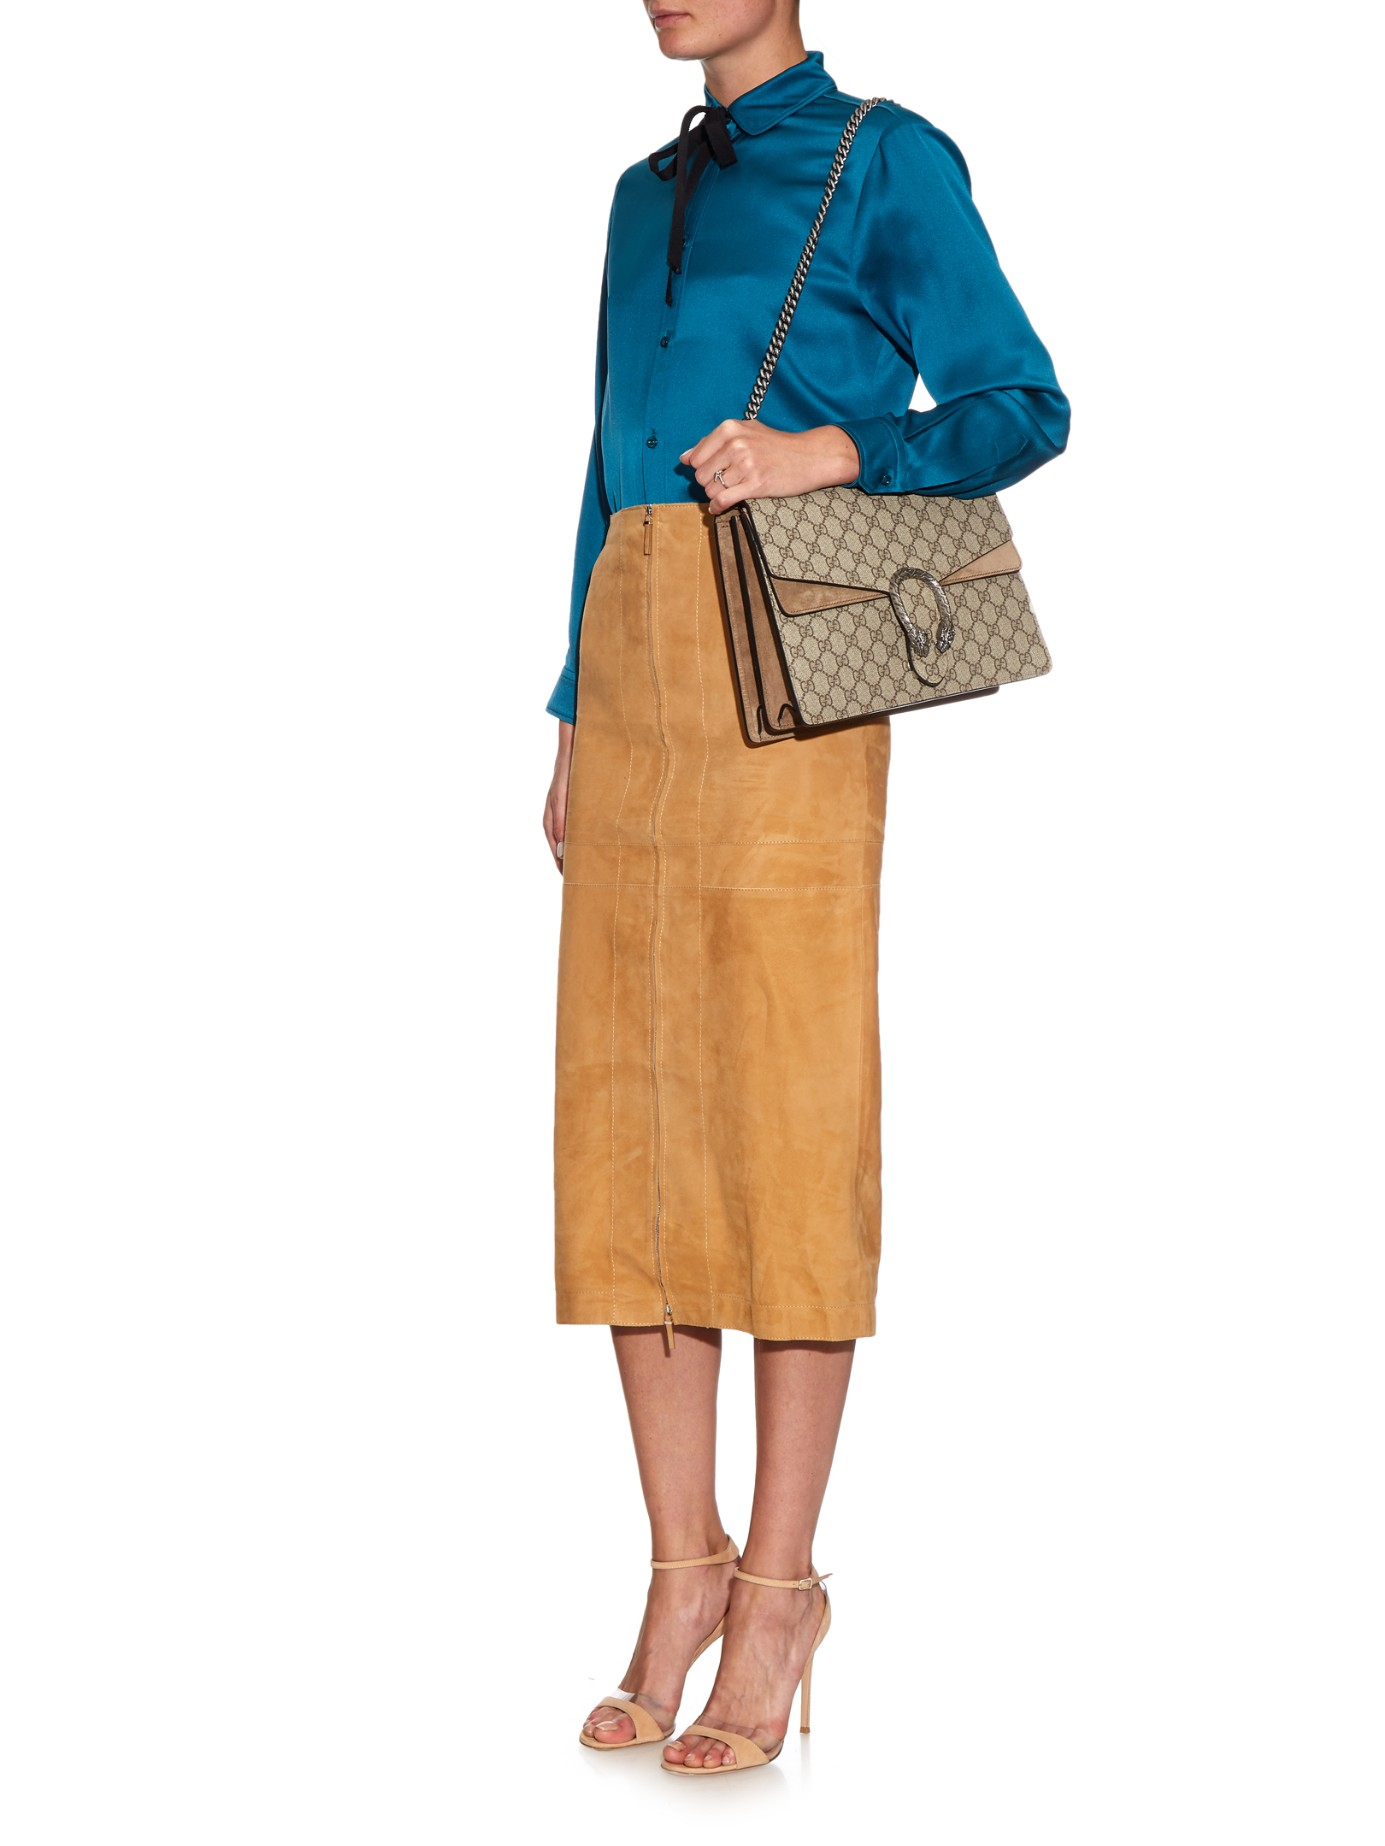 b870a470ce93 Gucci Dionysus Gg Supreme Canvas Shoulder Bag in Natural - Lyst